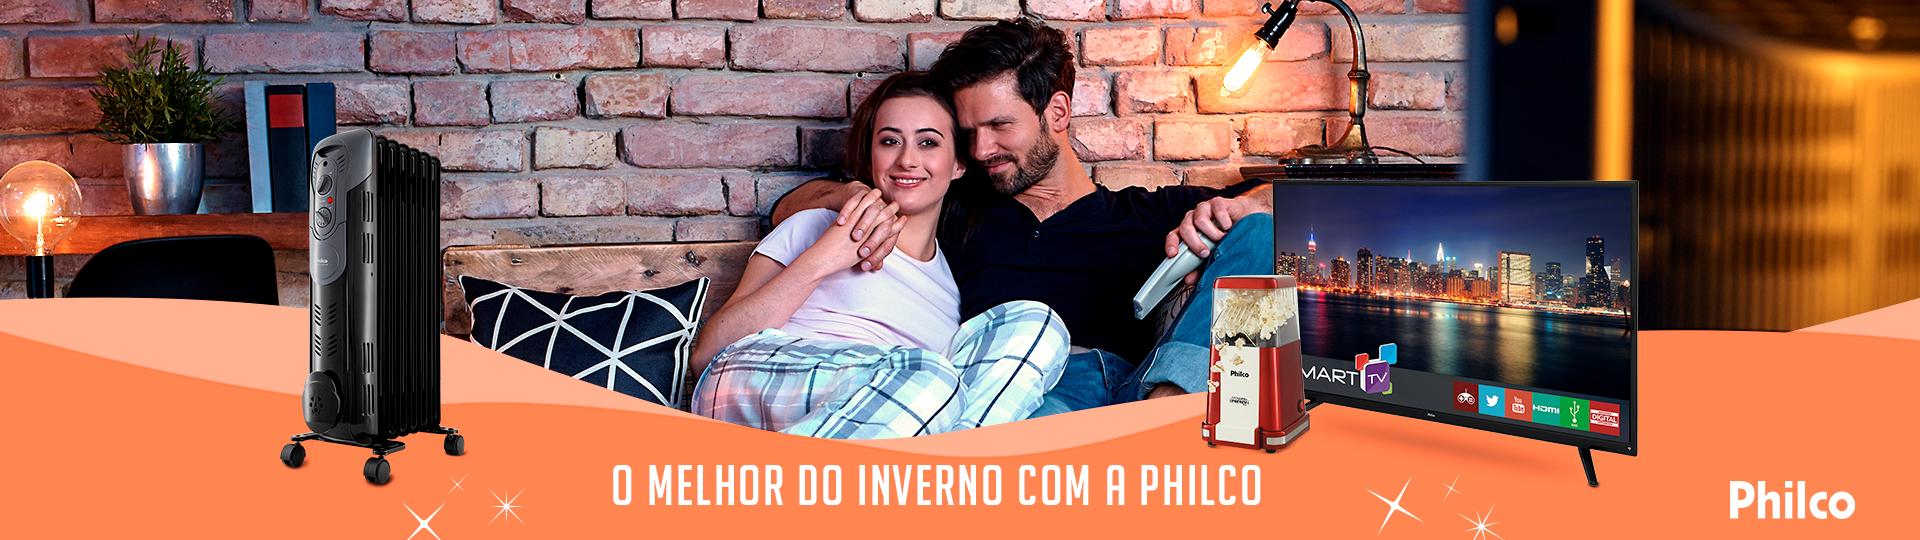 Banner-4-Philco